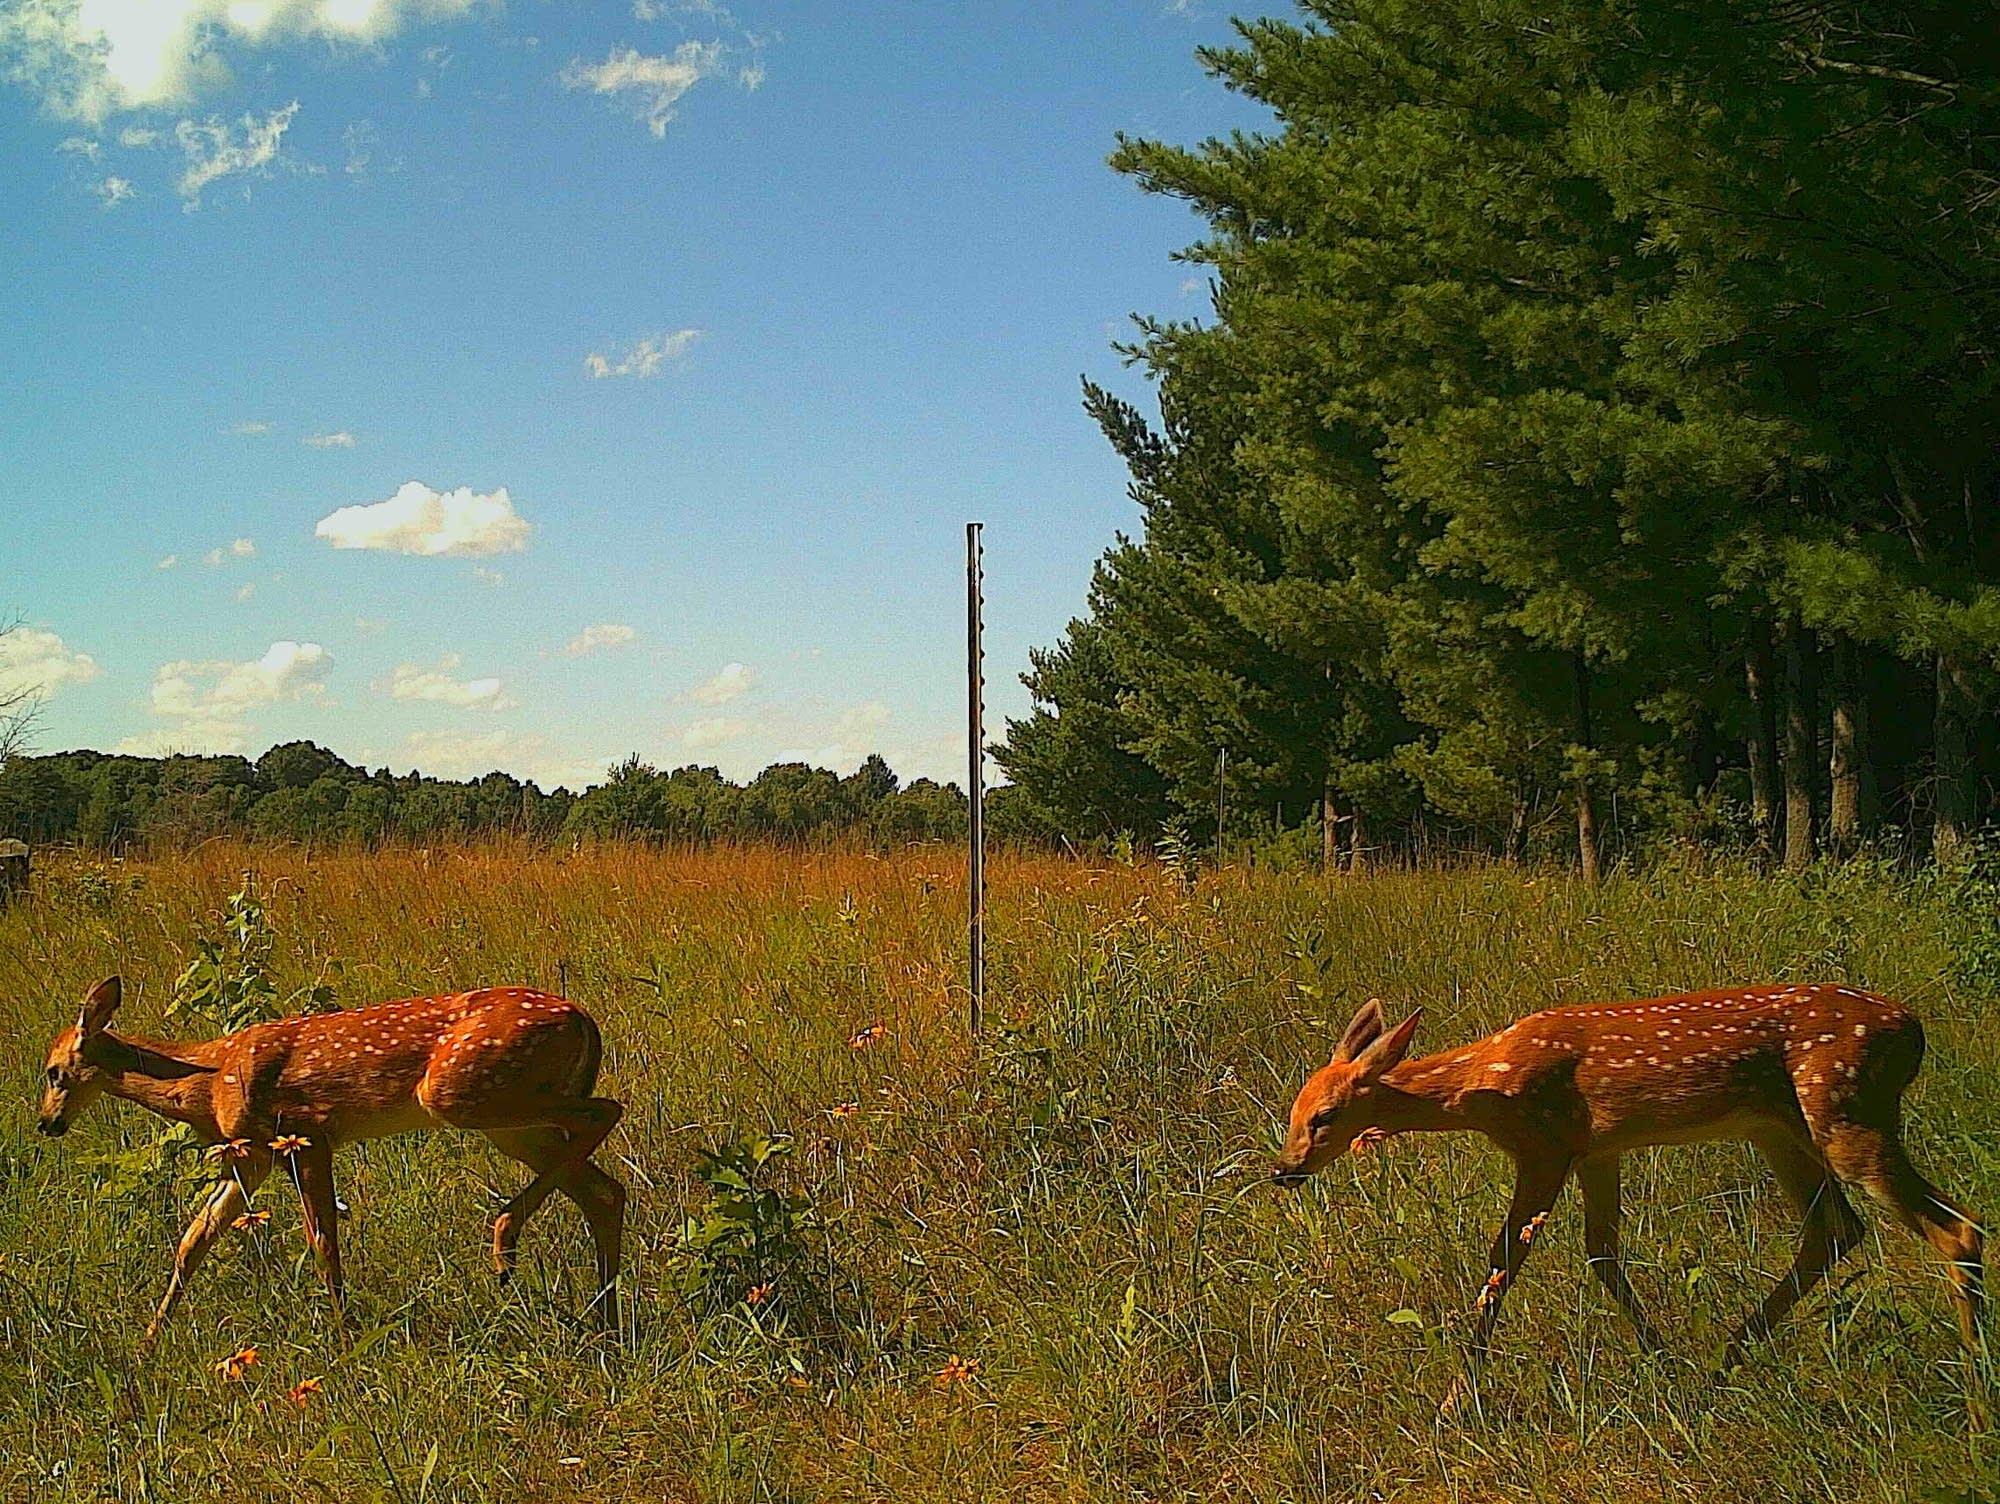 coyote weasel university of minnesota researchers seek help